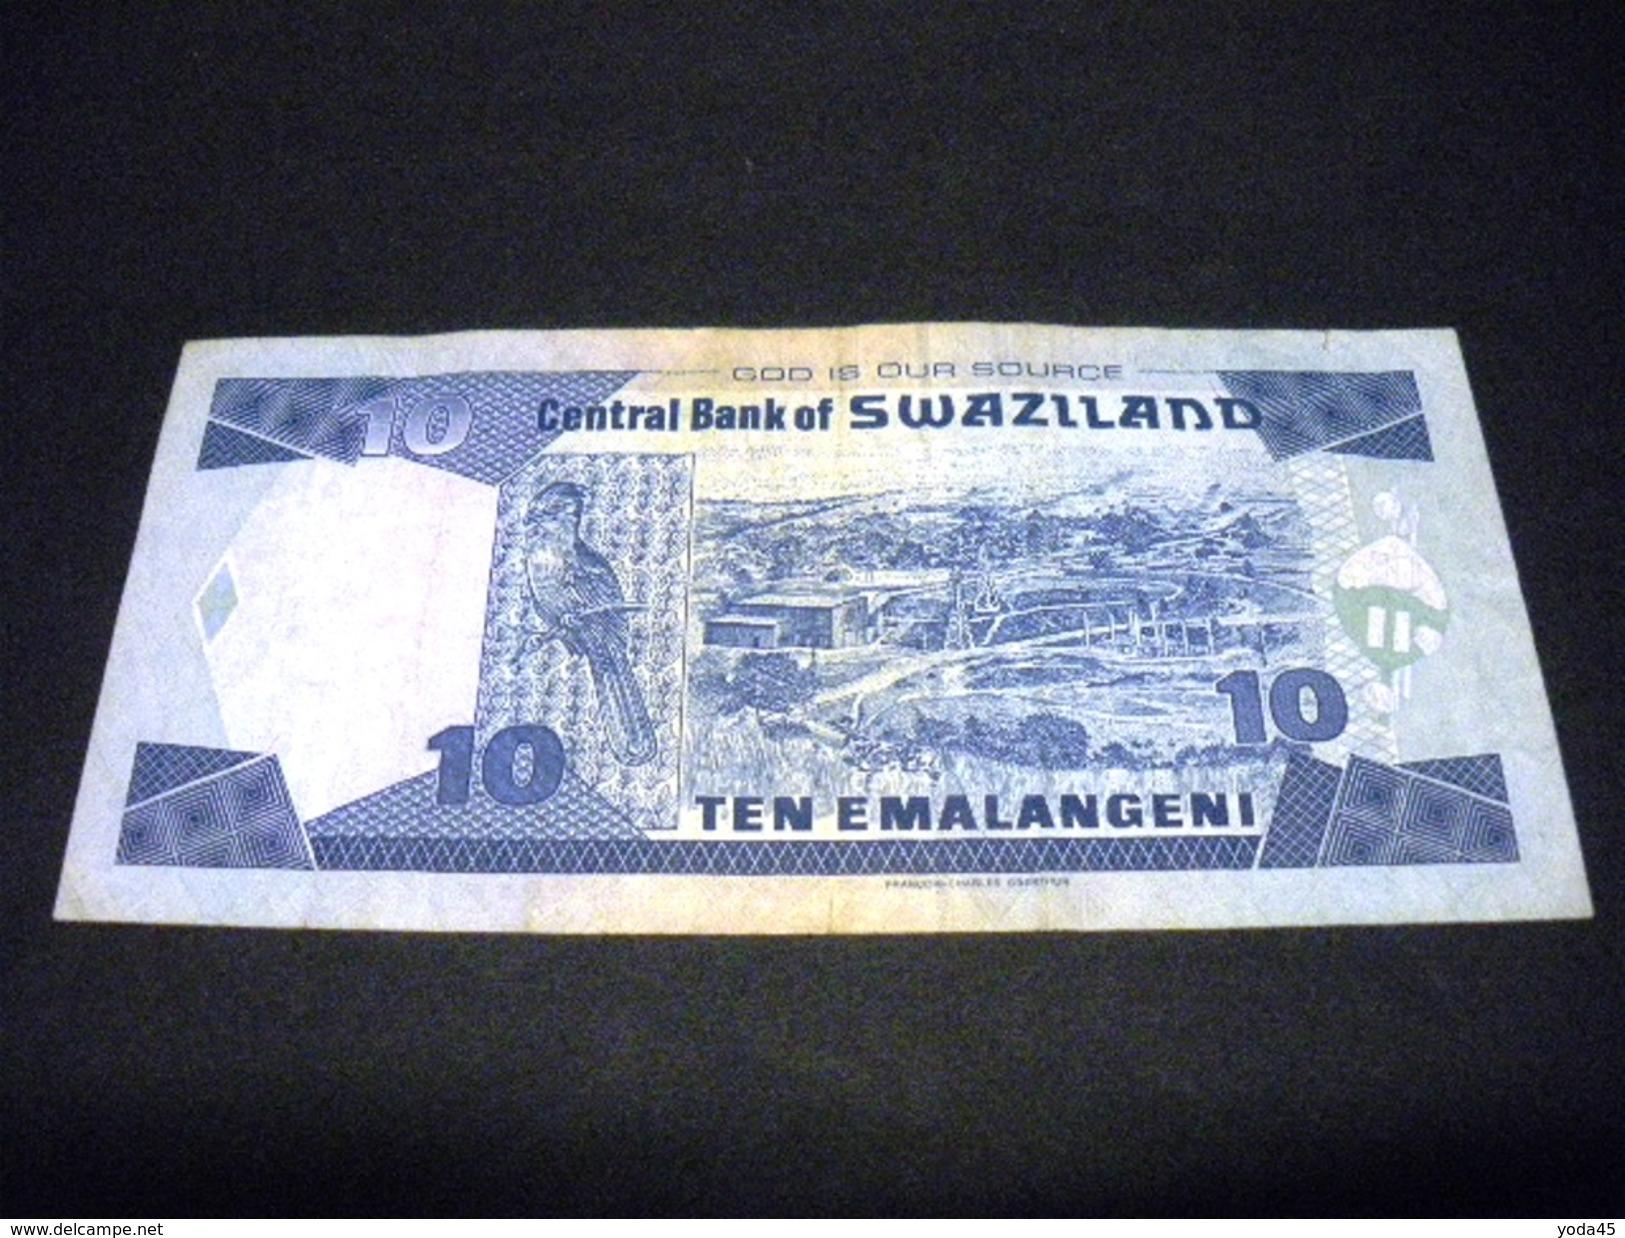 SWAZILAND 10 Emalangeni 01/04/2004 , Pick N° 29 B , SWAZILAND - Swaziland